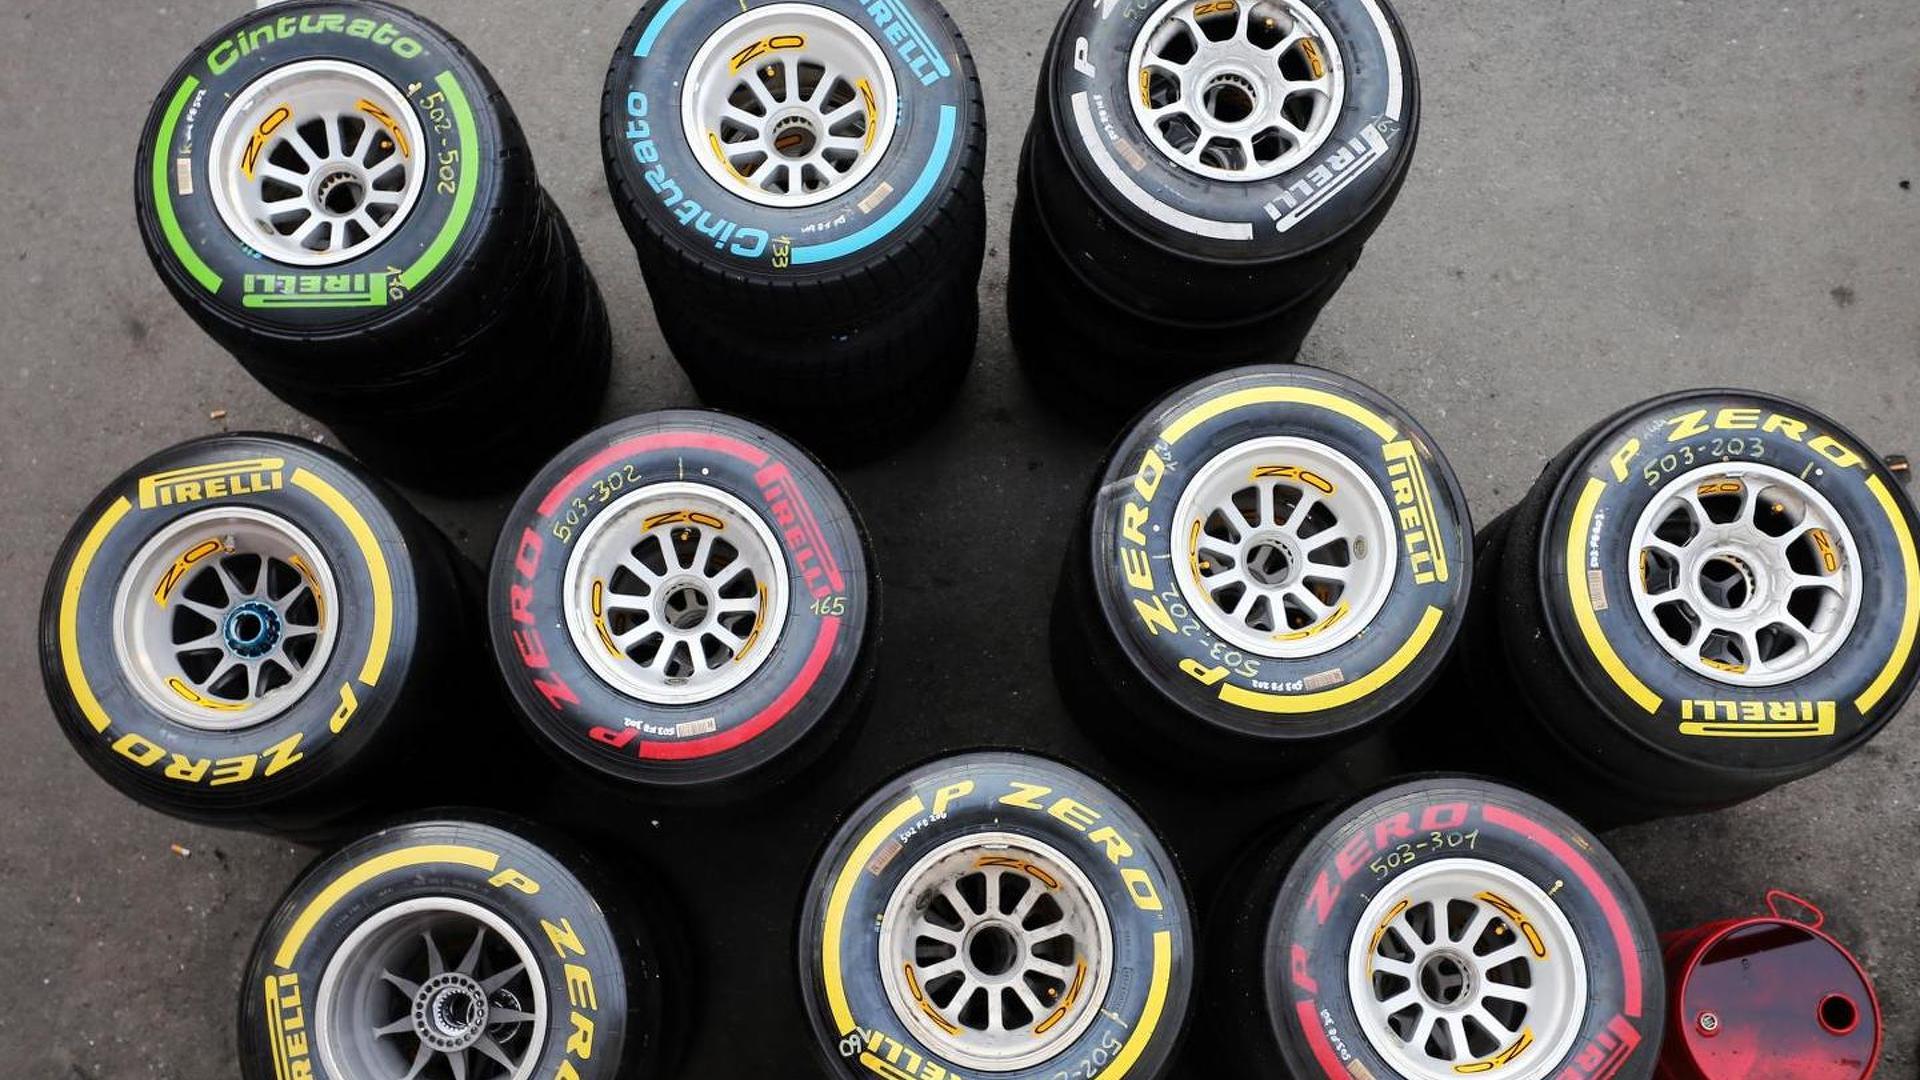 2015 Pirelli tyres 'not spectacular' - Hamilton